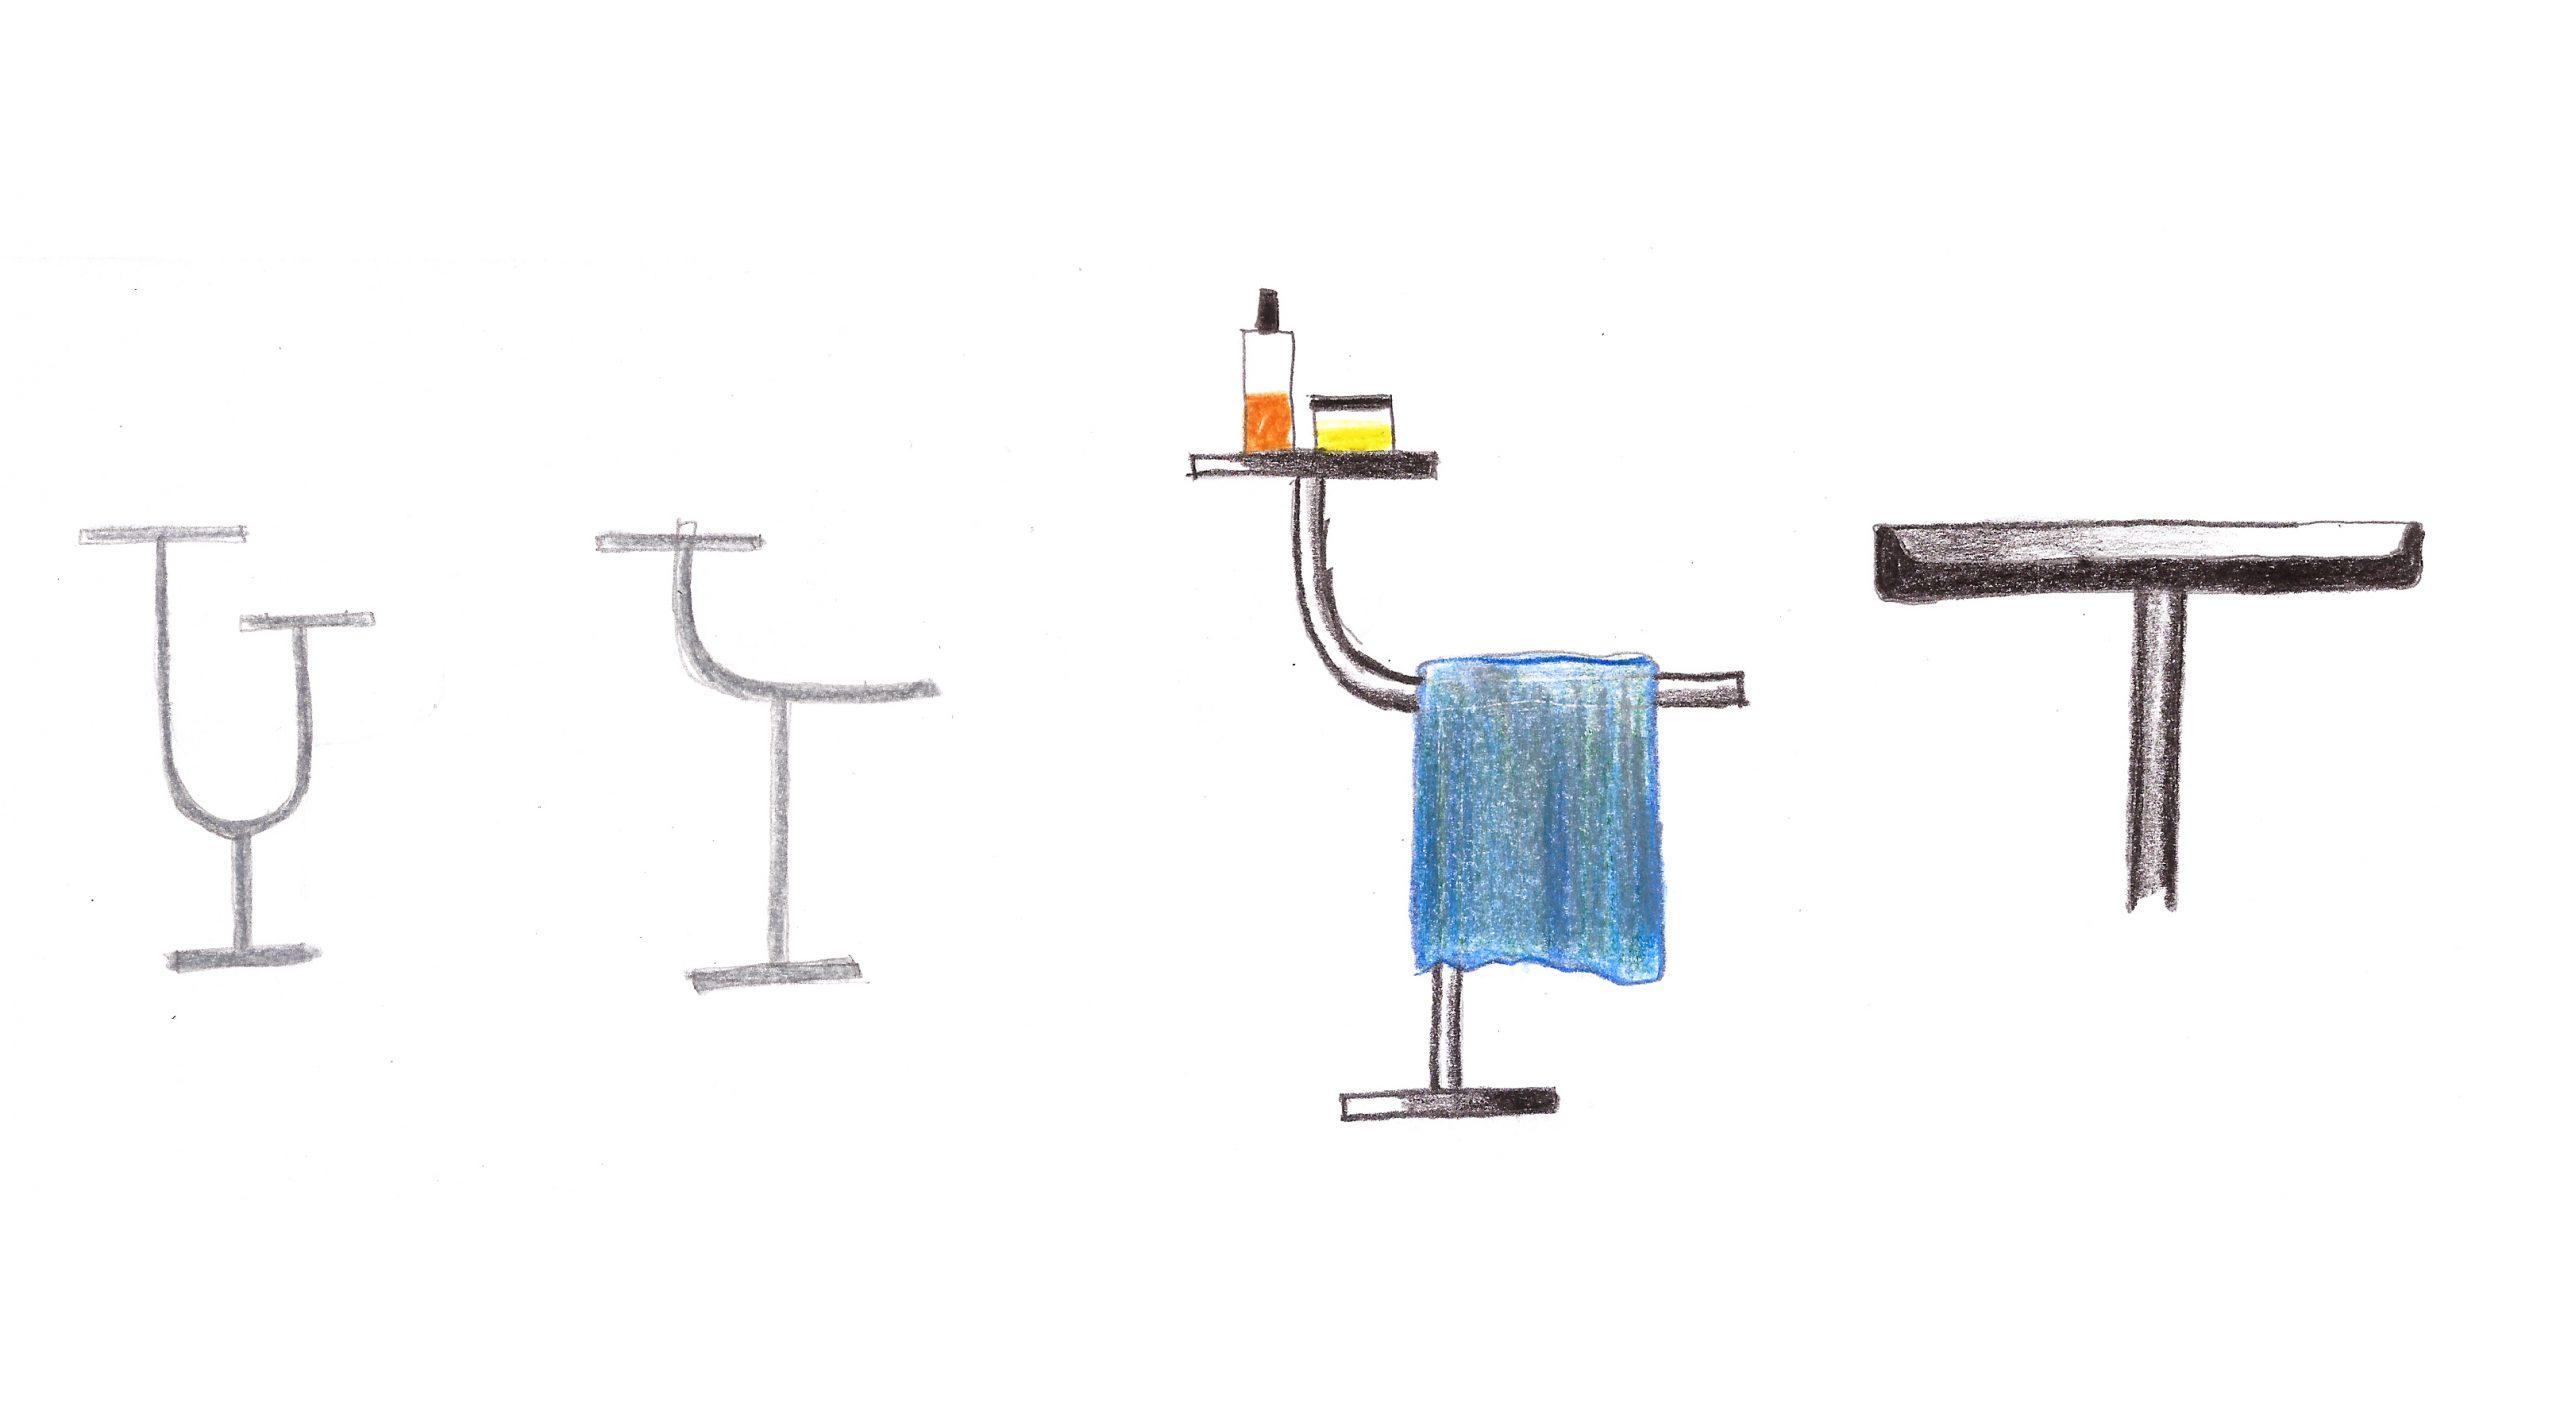 Sketch of Bivio bathroom accessories by Daniel Debiasi and Federico Sandri